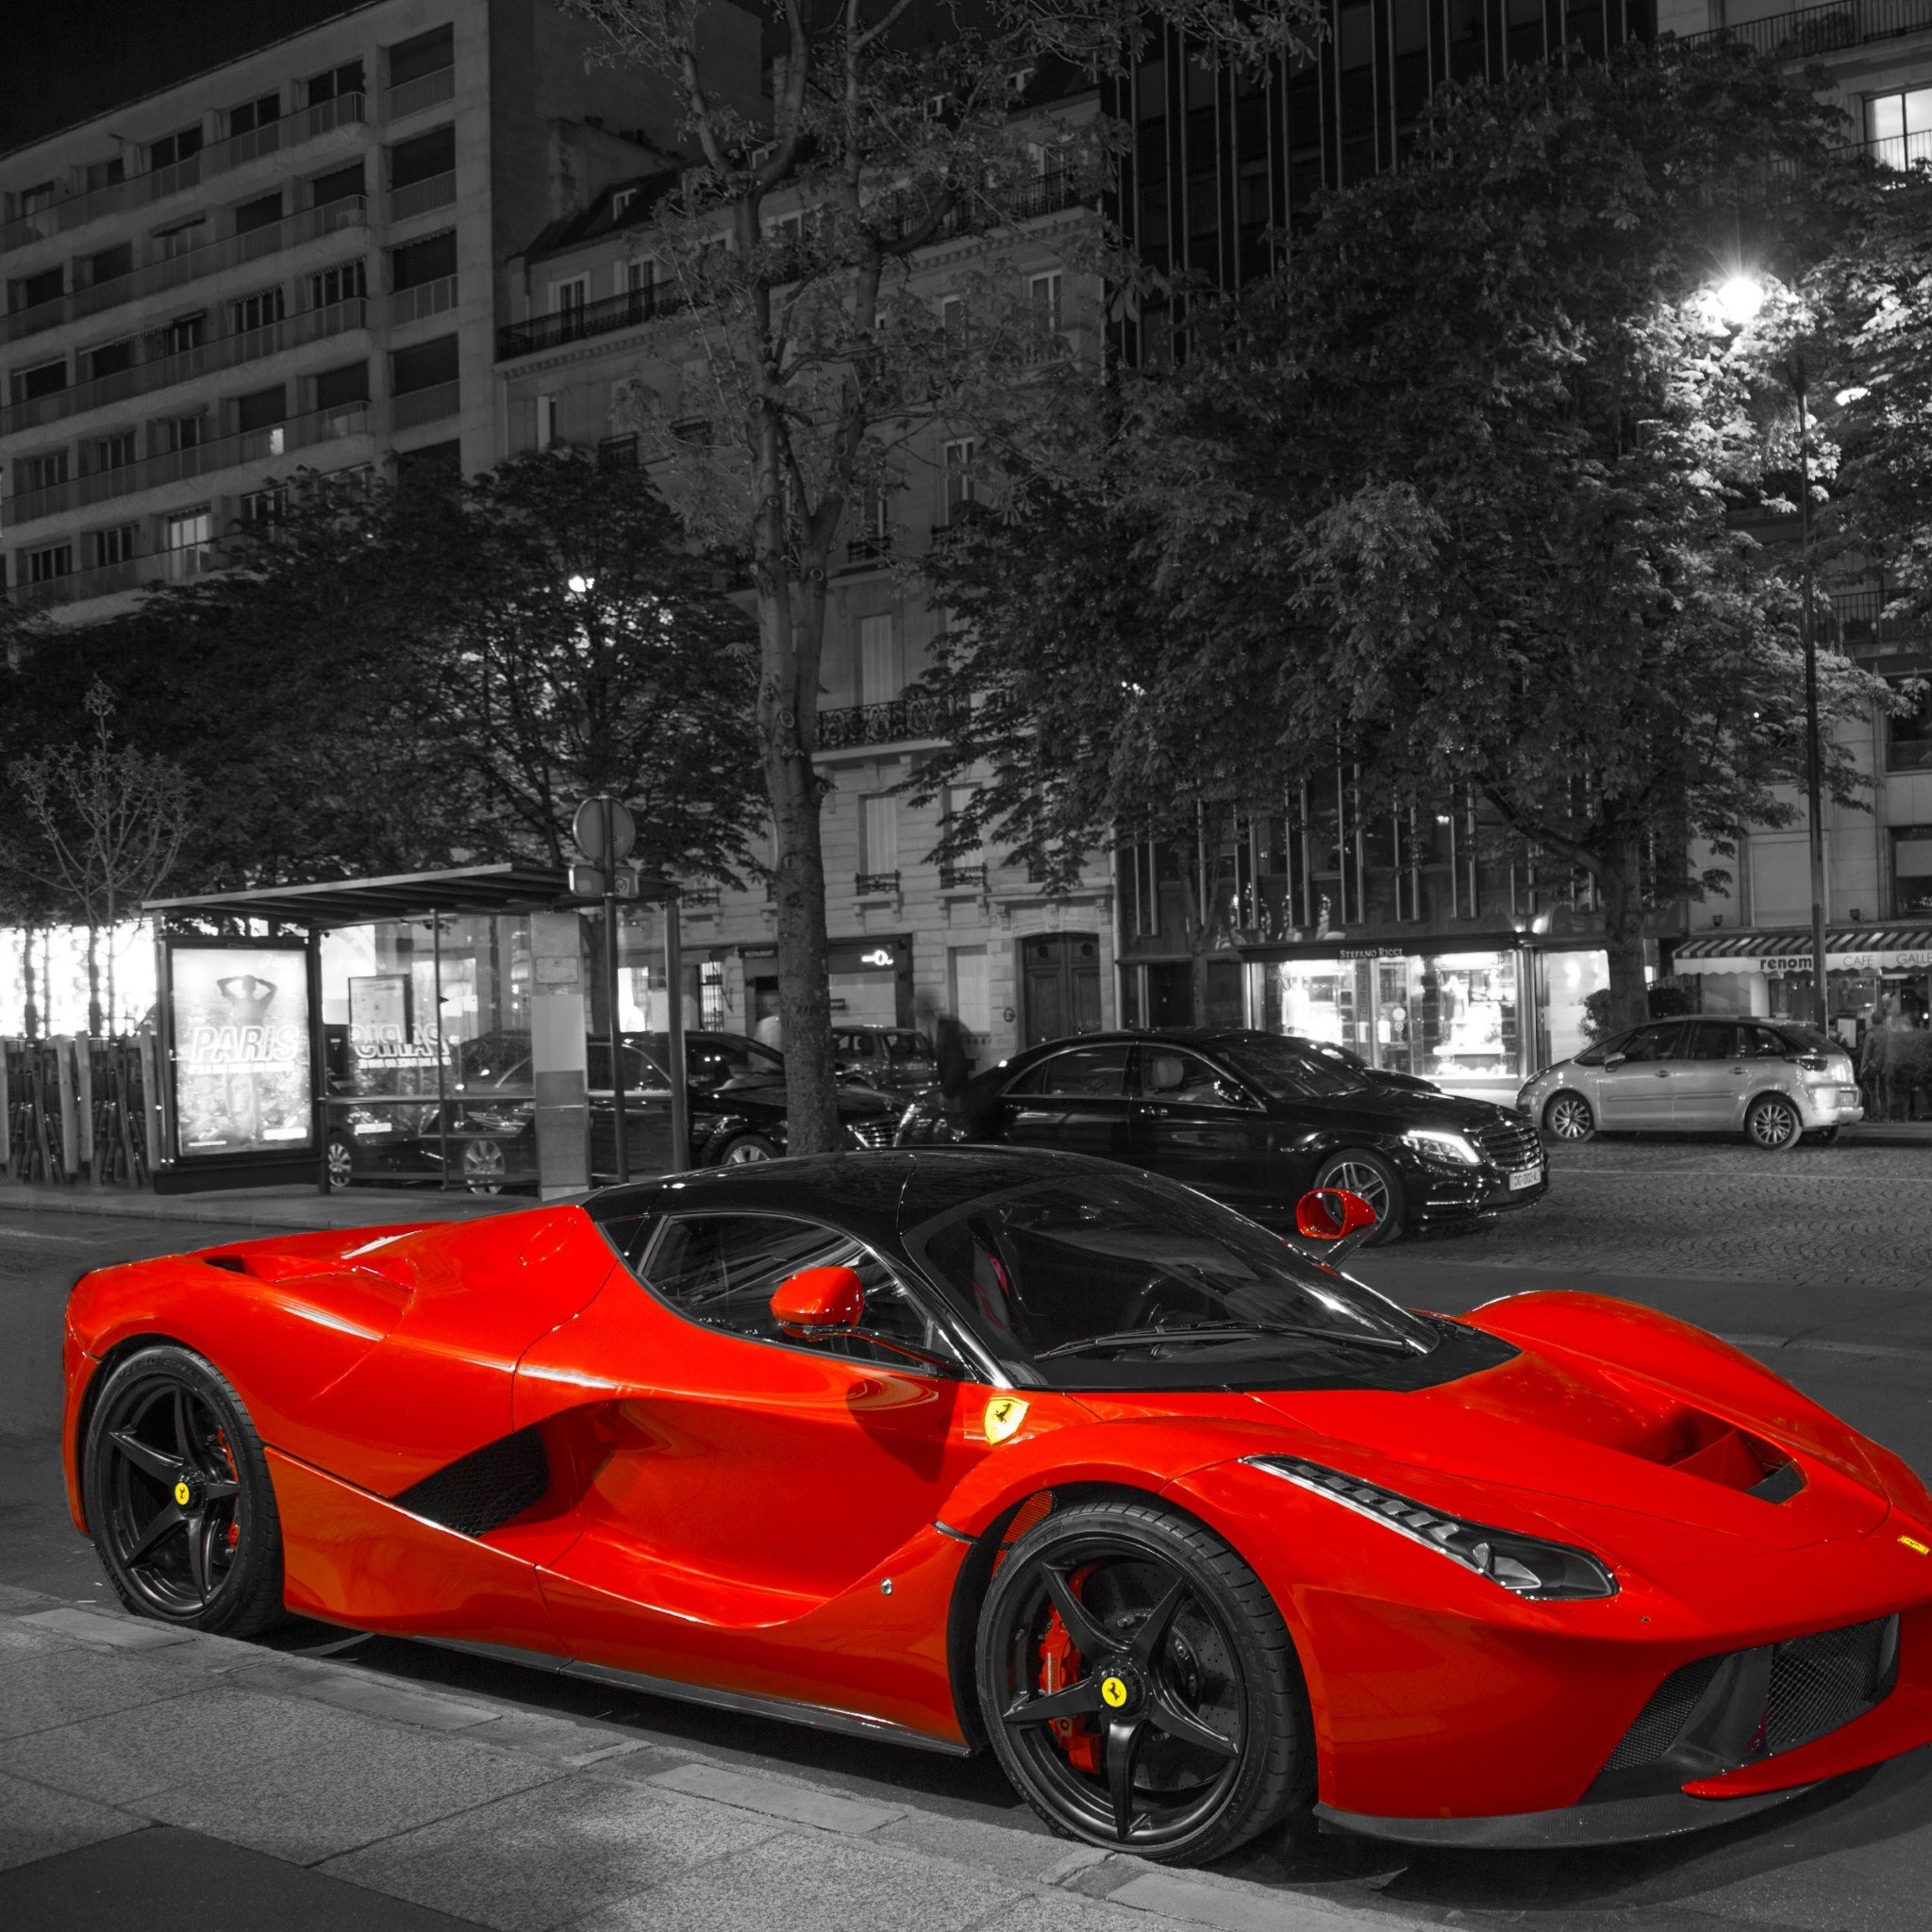 Super Red Car Laferrari Wallpaper S Photo S Image S Ferrari Laferrari Fotos Boas Fotos